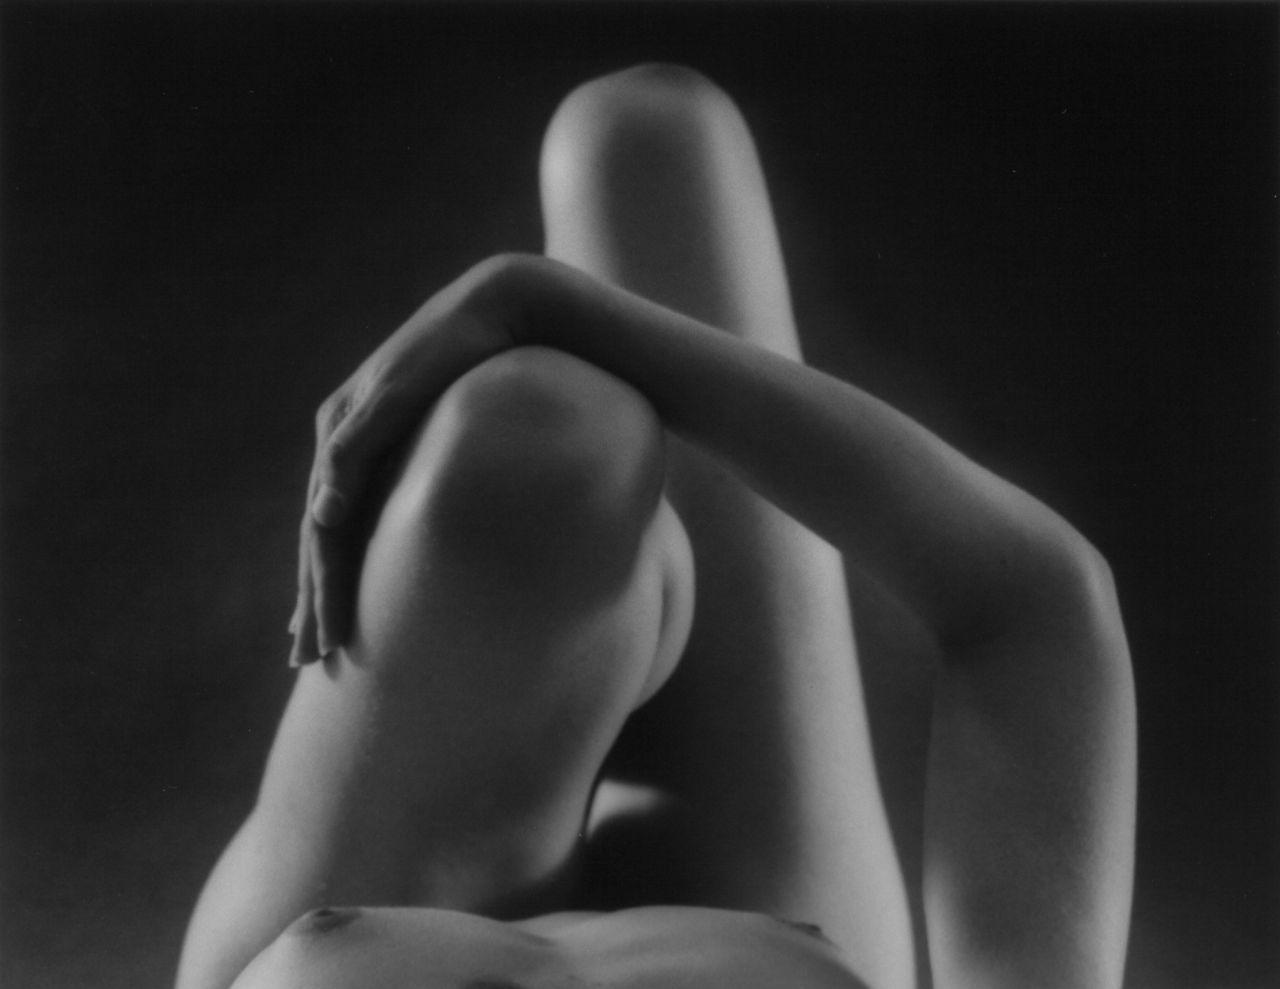 Ruth Bernhard- Knees and Arm, 1976